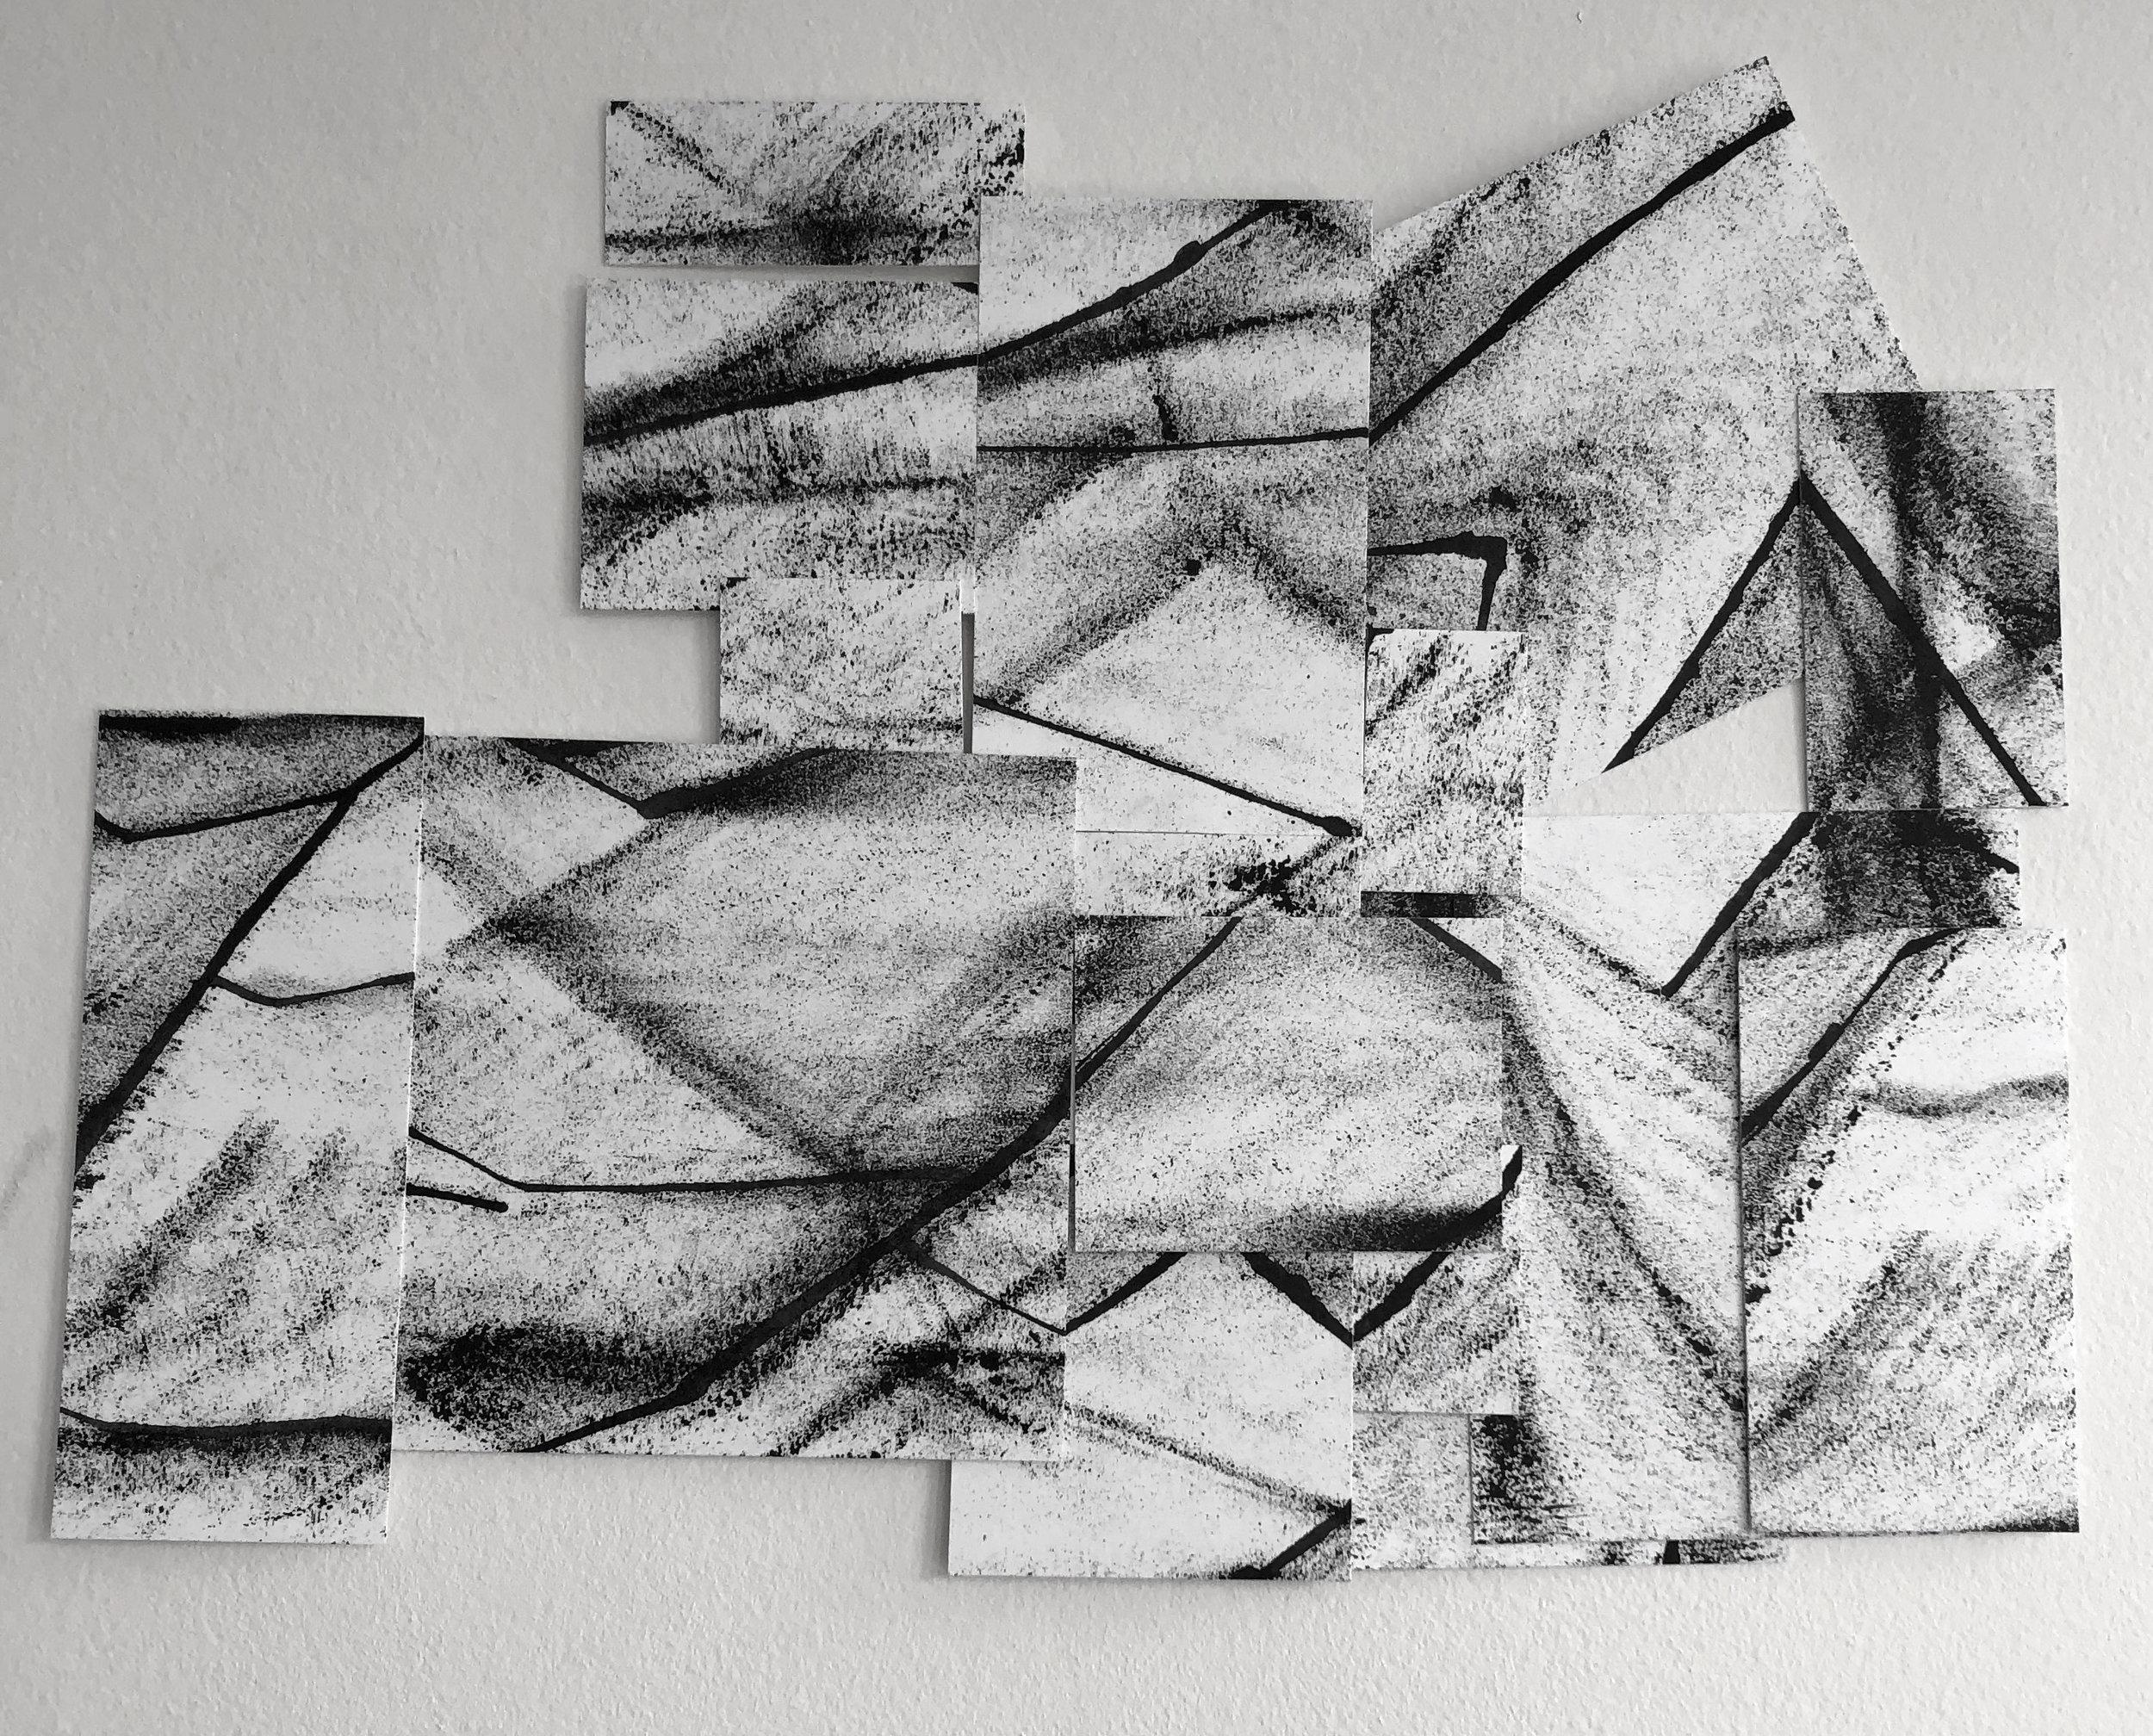 We Heard, 11x14, Ink on Paper